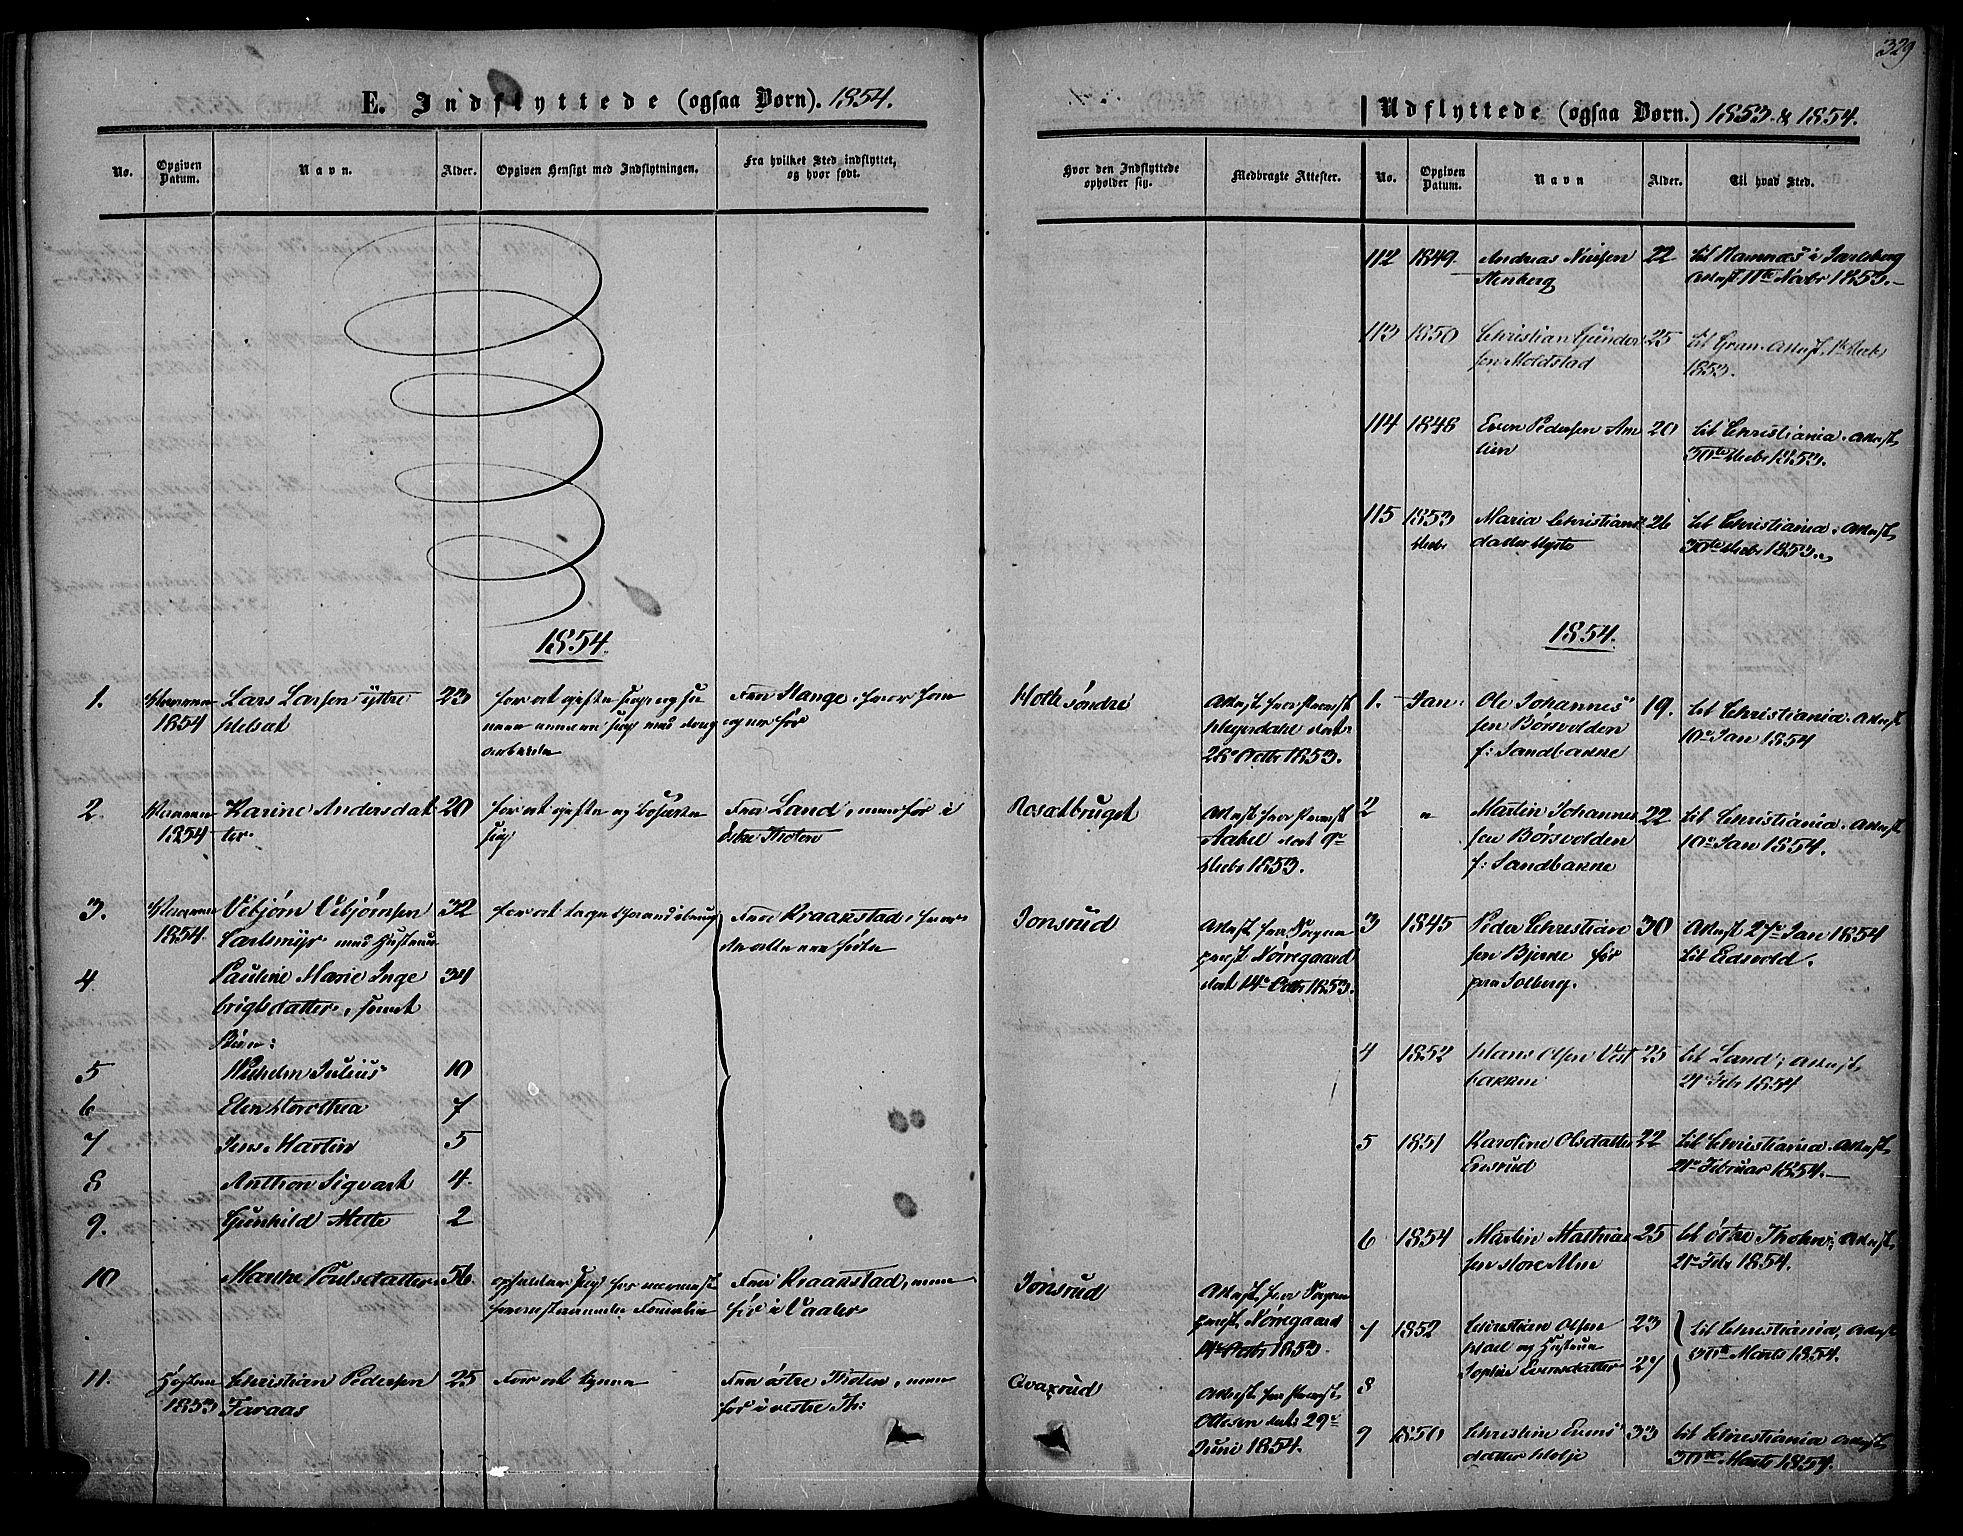 SAH, Vestre Toten prestekontor, H/Ha/Haa/L0005: Ministerialbok nr. 5, 1850-1855, s. 329